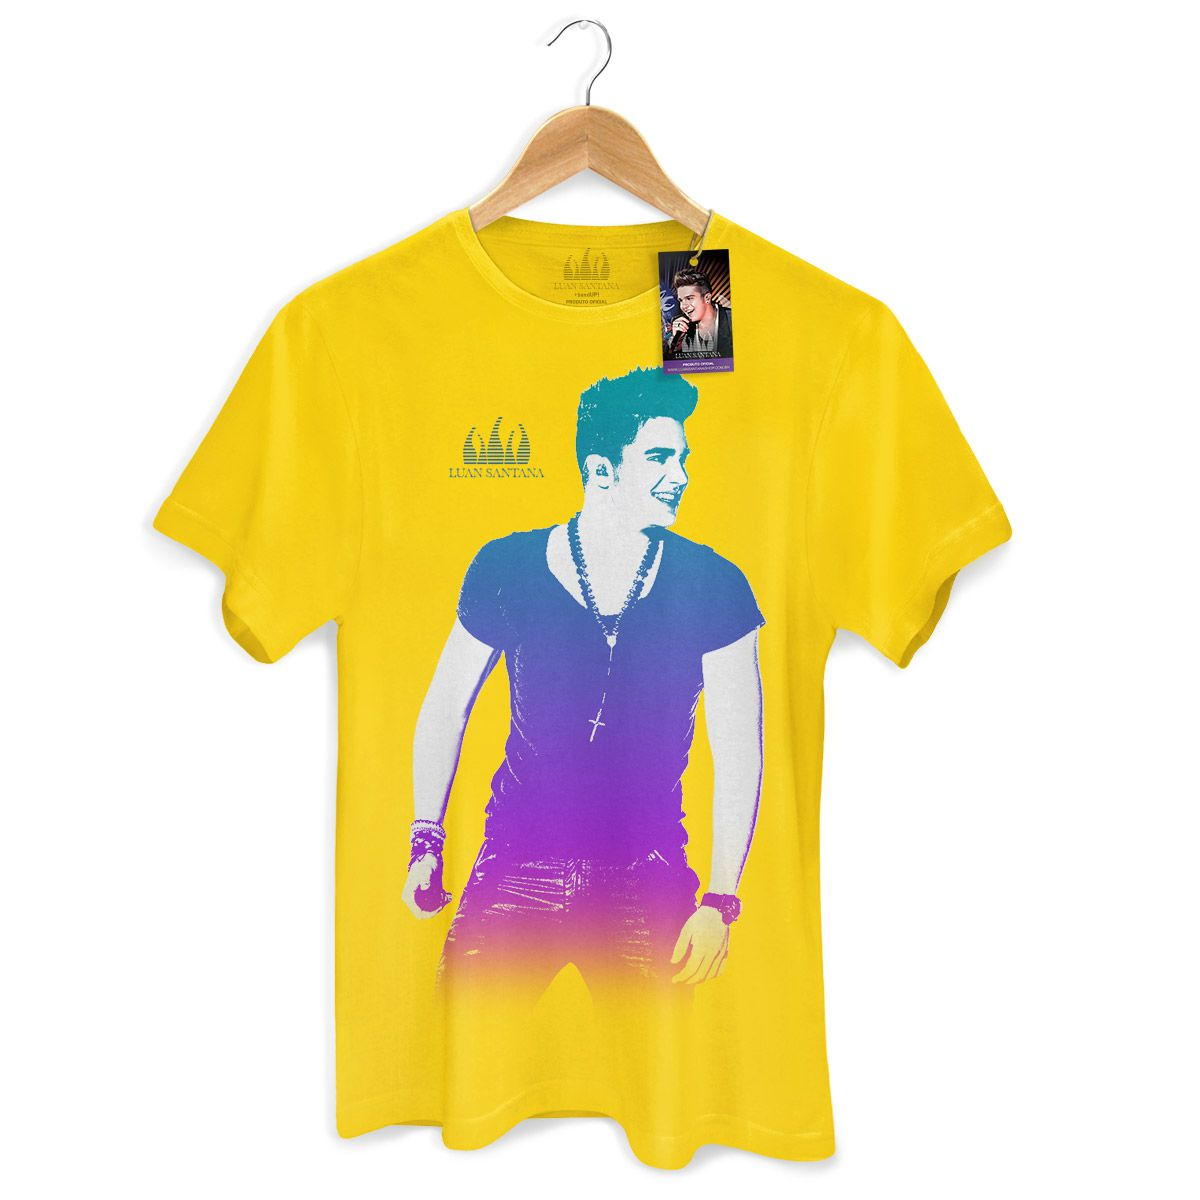 Camiseta Masculina Luan Santana Foto Degradê